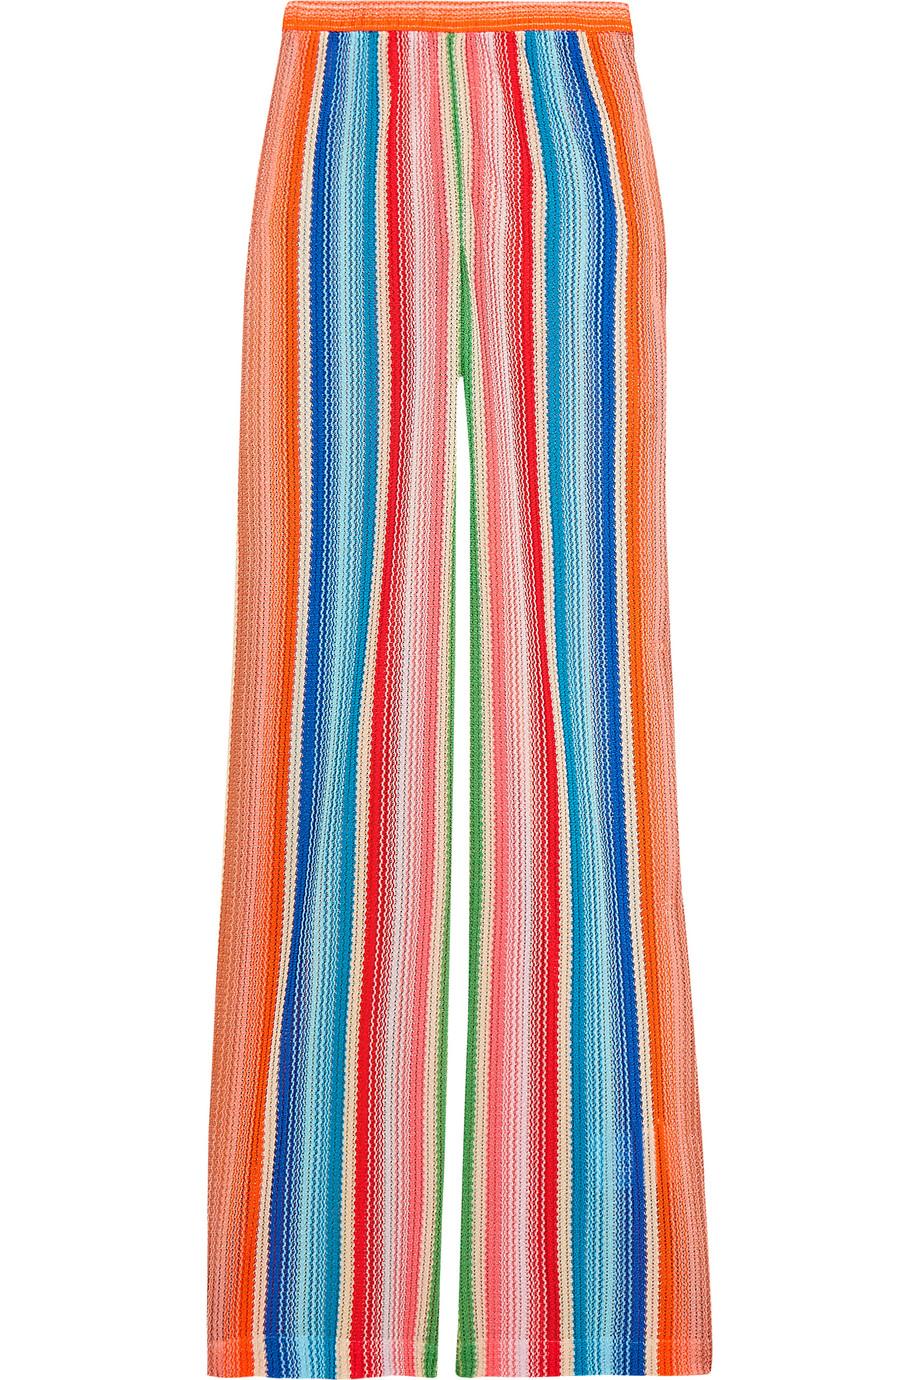 Missoni Mare Striped Crochet-Knit Pants, Pink/Blue, Women's, Size: 38